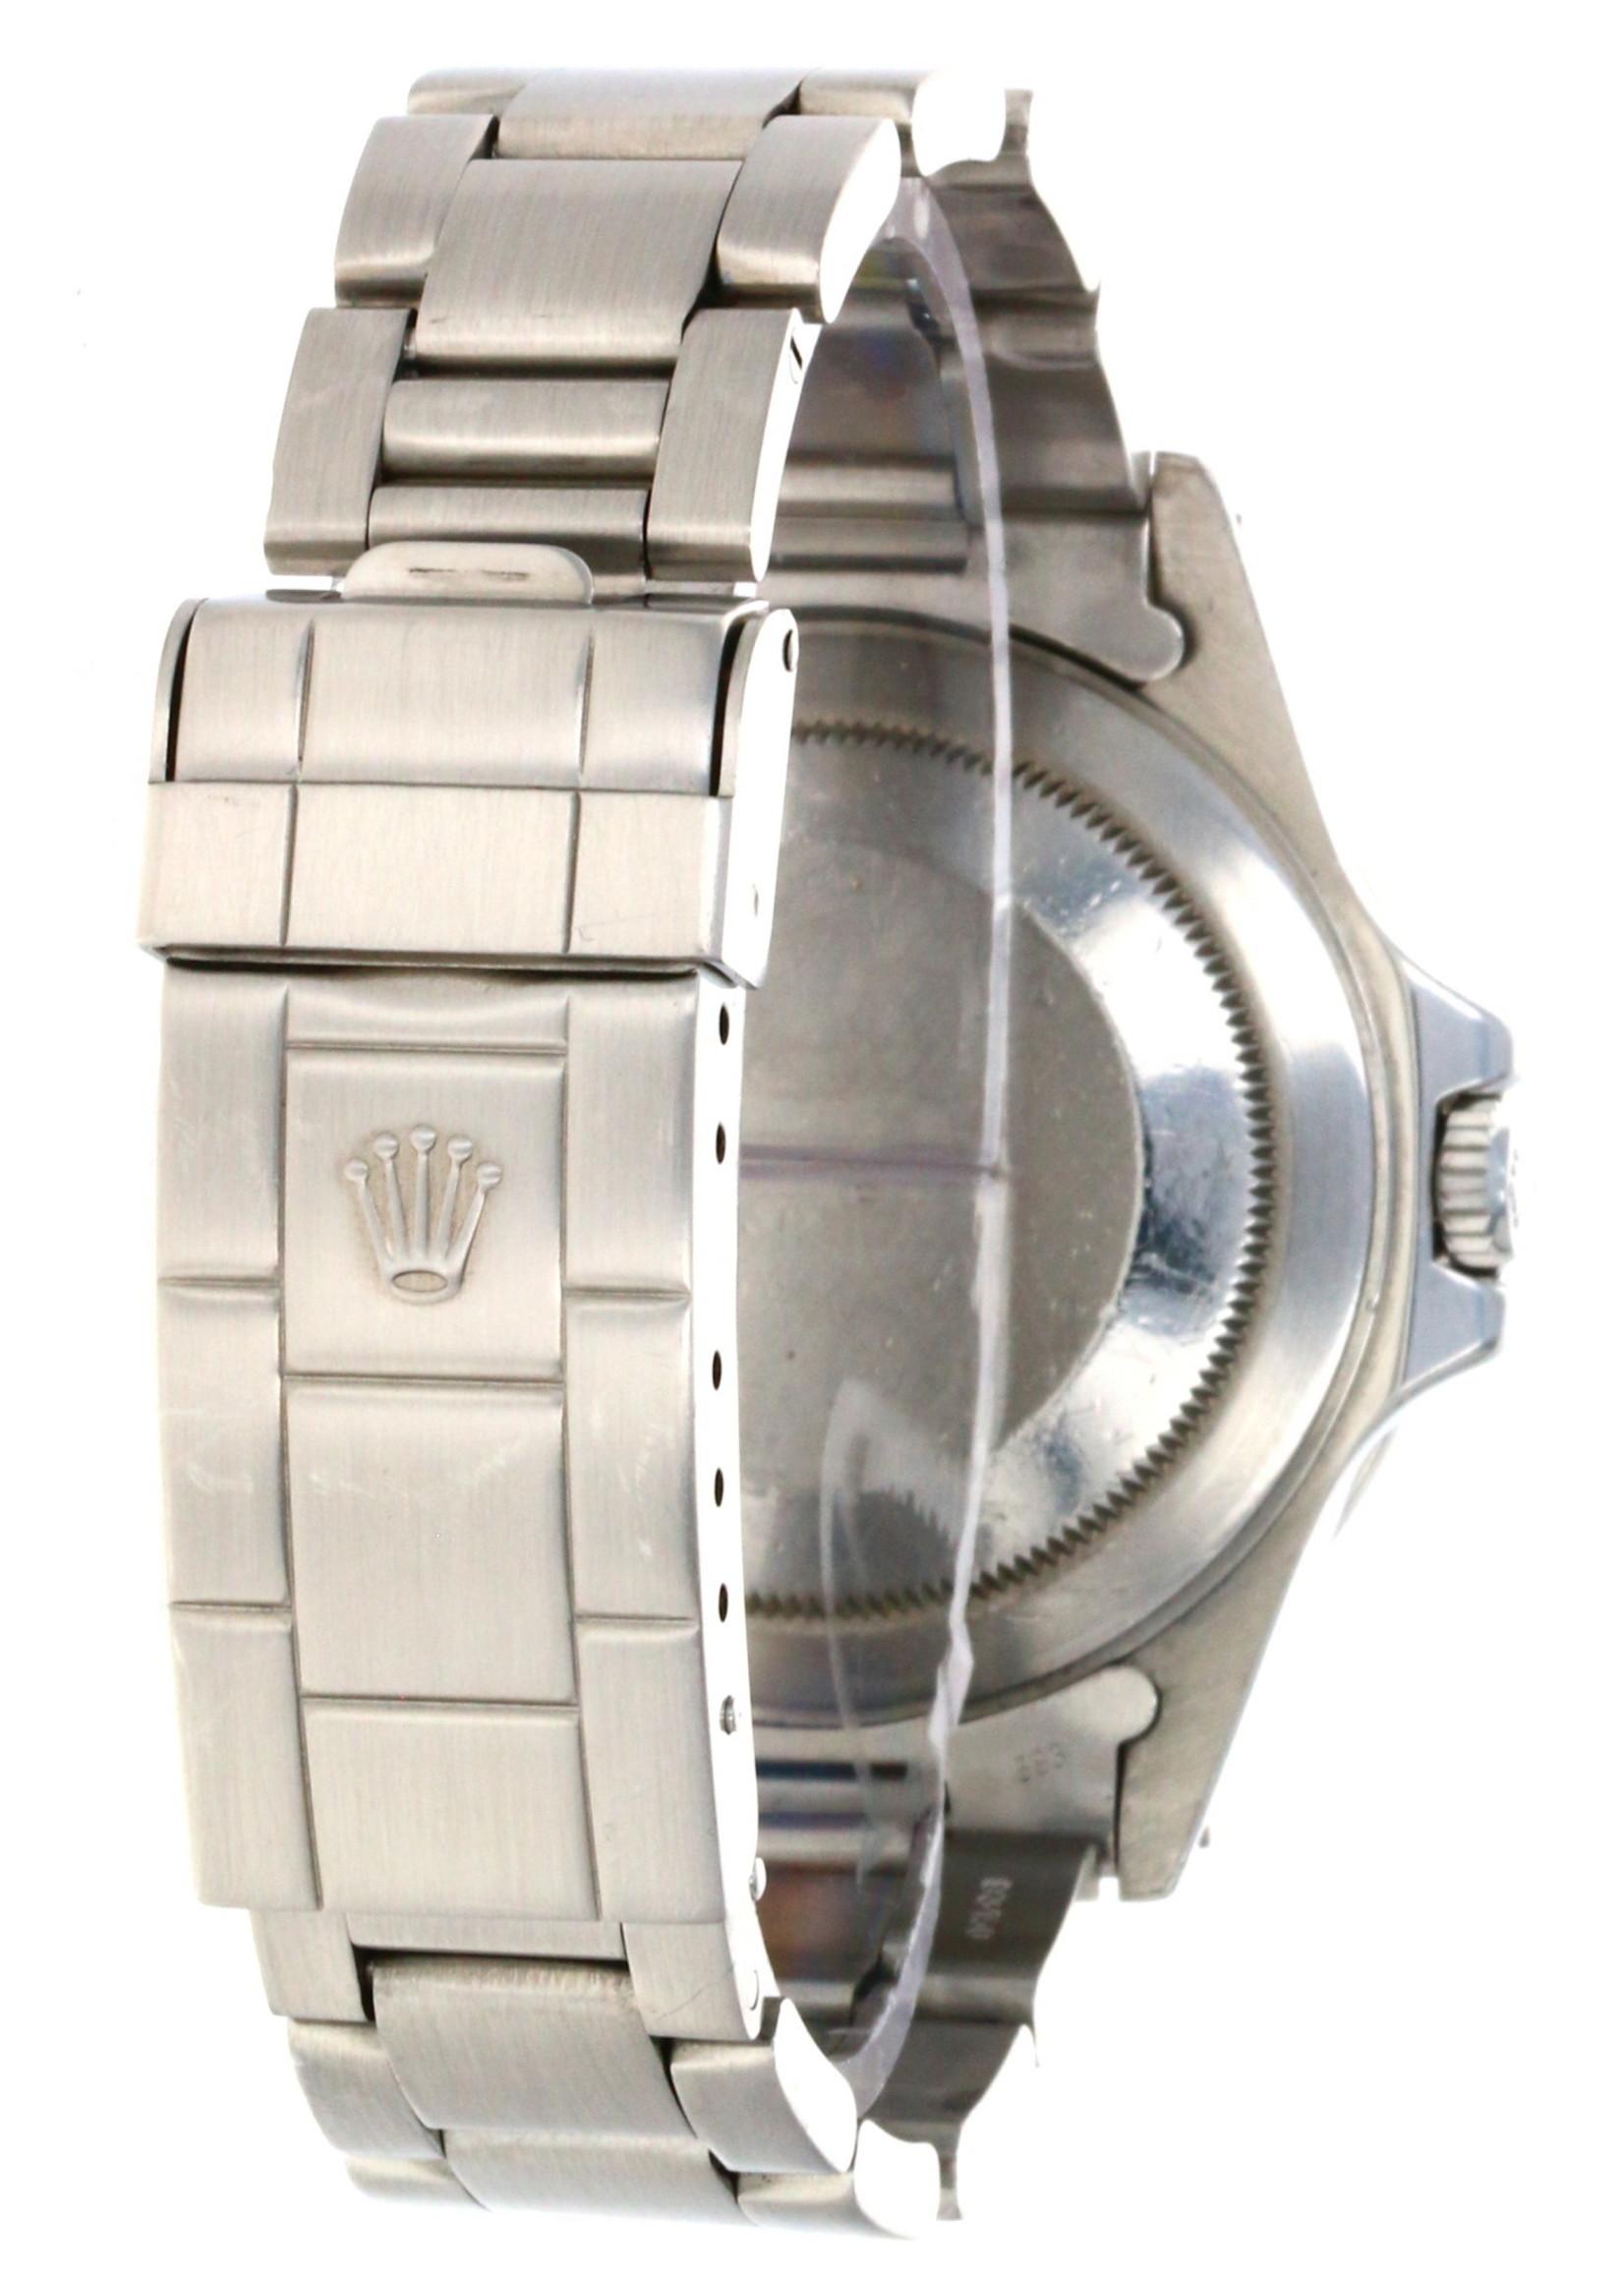 Rolex Watches ROLEX EXPLORER II (1985) #16550  ROLEX SERVICE HANDS - AFTERMARKET DIAL